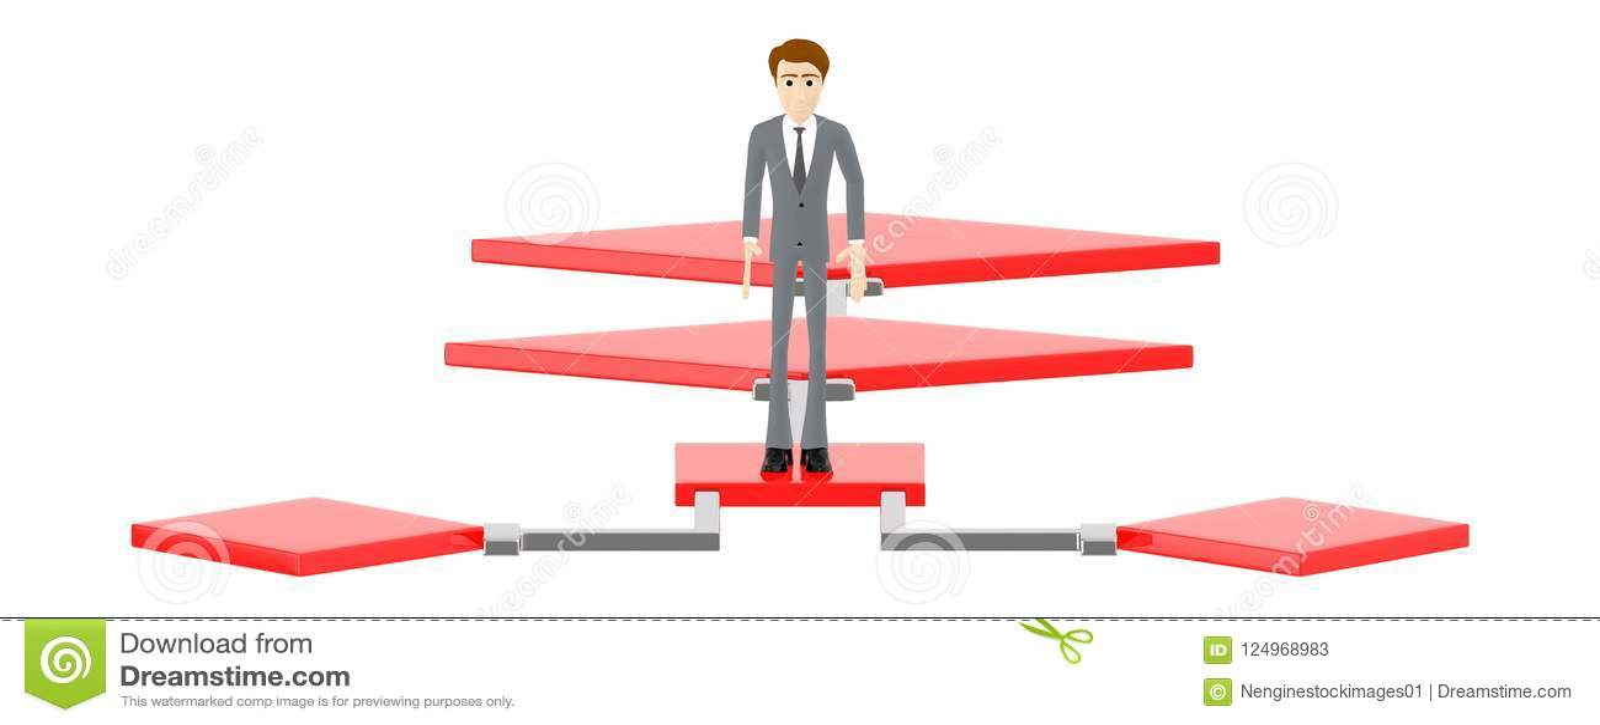 3d character , man standing over a flow chart